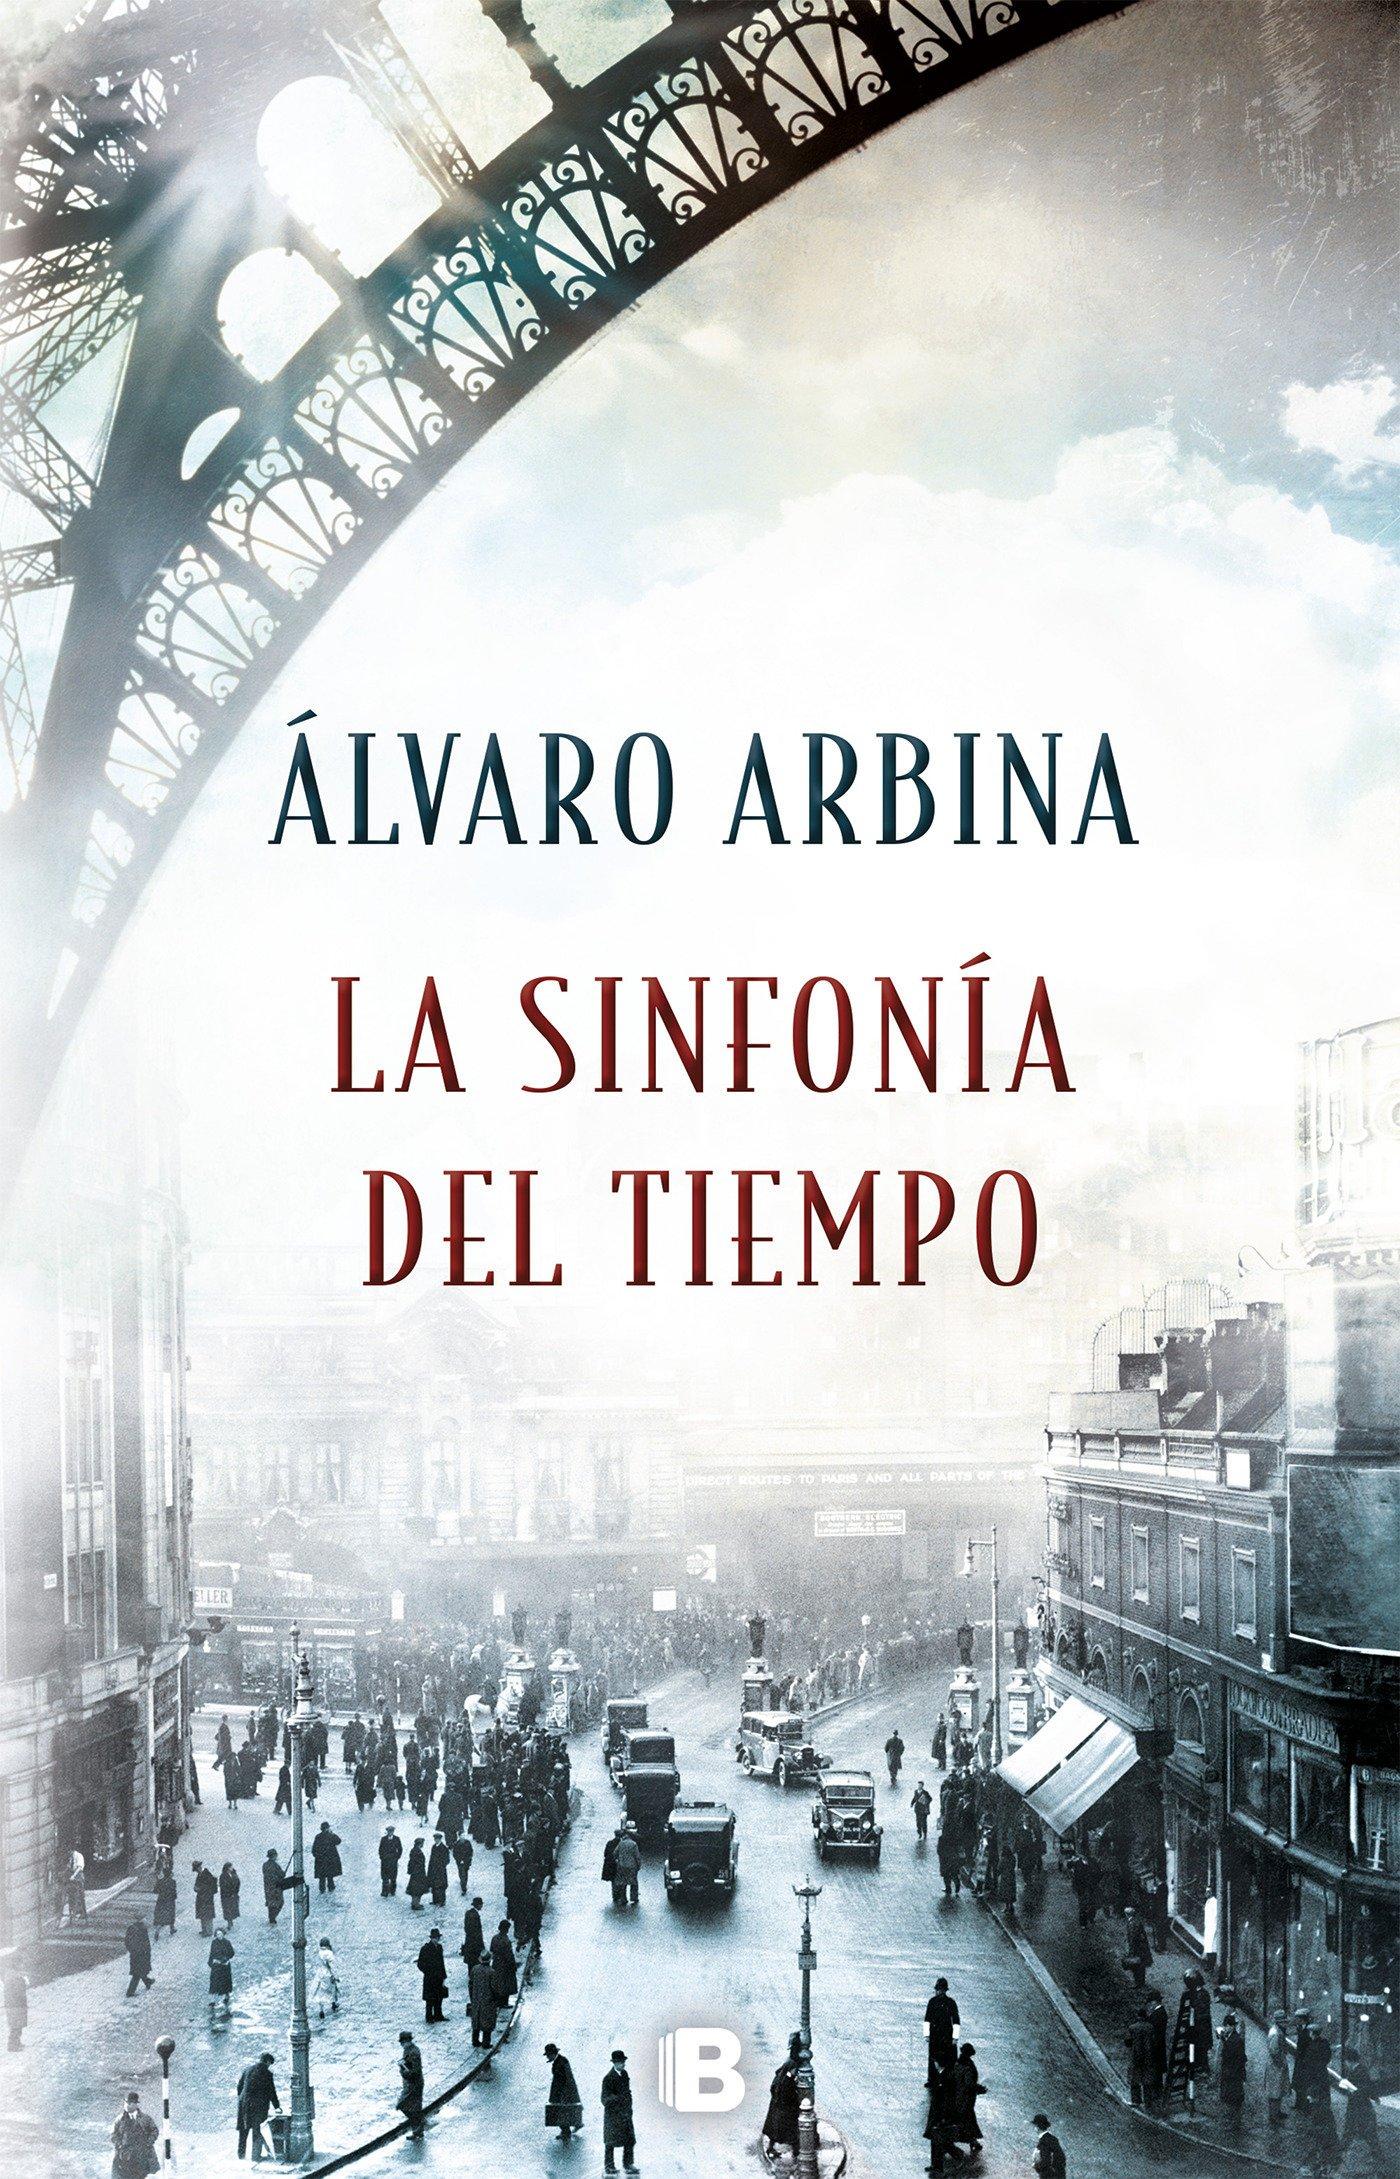 La sinfonía del tiempo / The Symphony of Time (Spanish Edition): Alvaro Arbina: 9788466662765: Amazon.com: Books